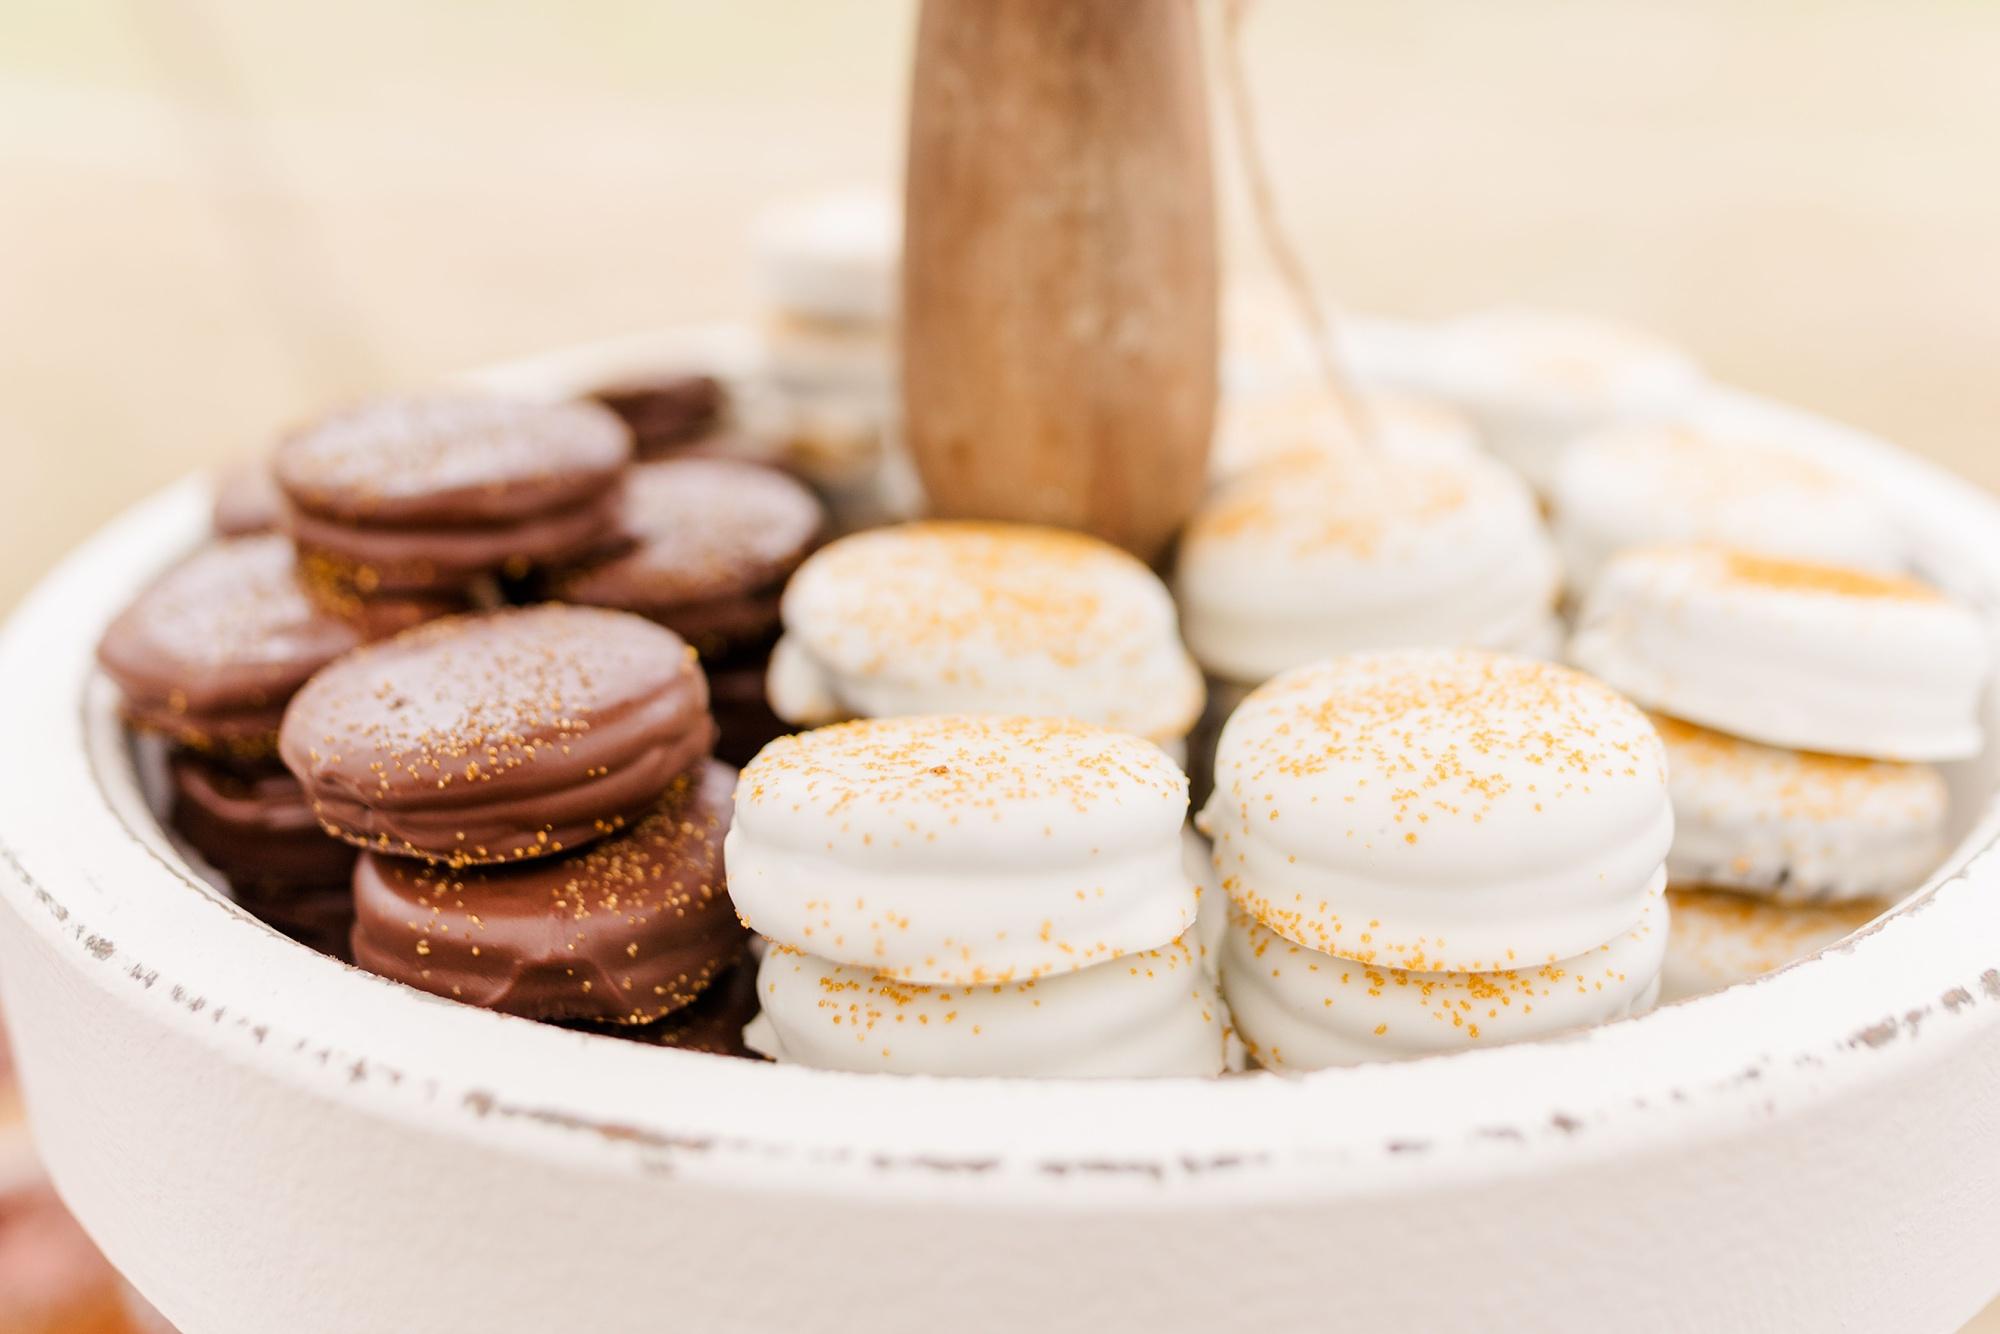 wedding desserts for New Year's Eve wedding reception